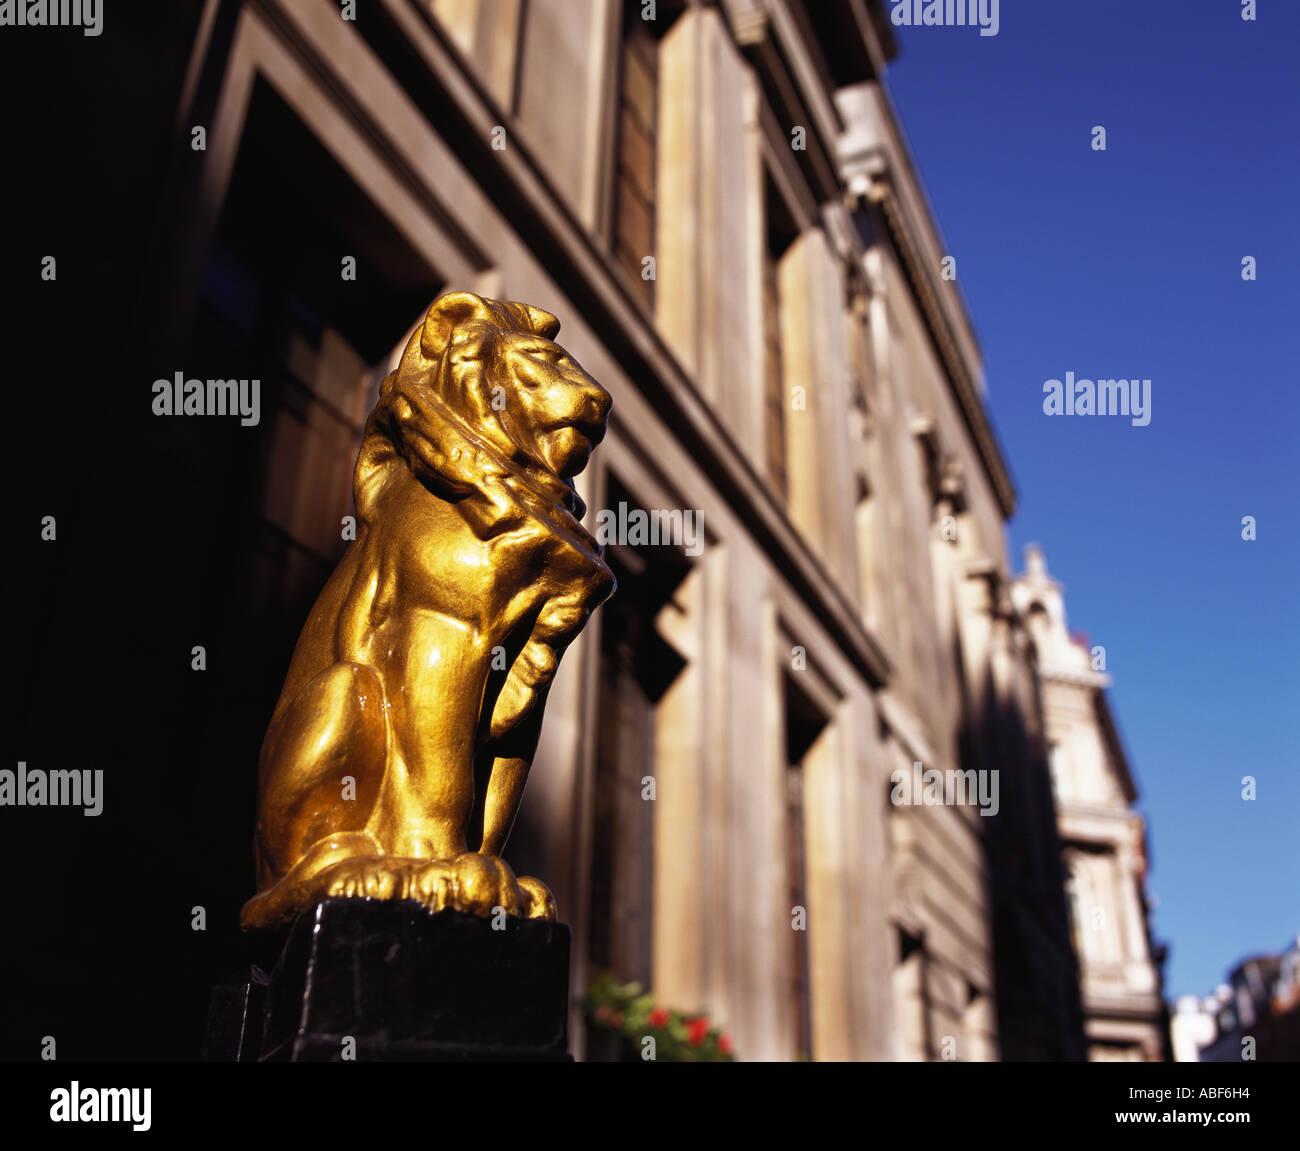 Gilded lion outside Law Society Halls Nr Inns of Court Chancery Lane London england uk united kingdom britain europe eu - Stock Image